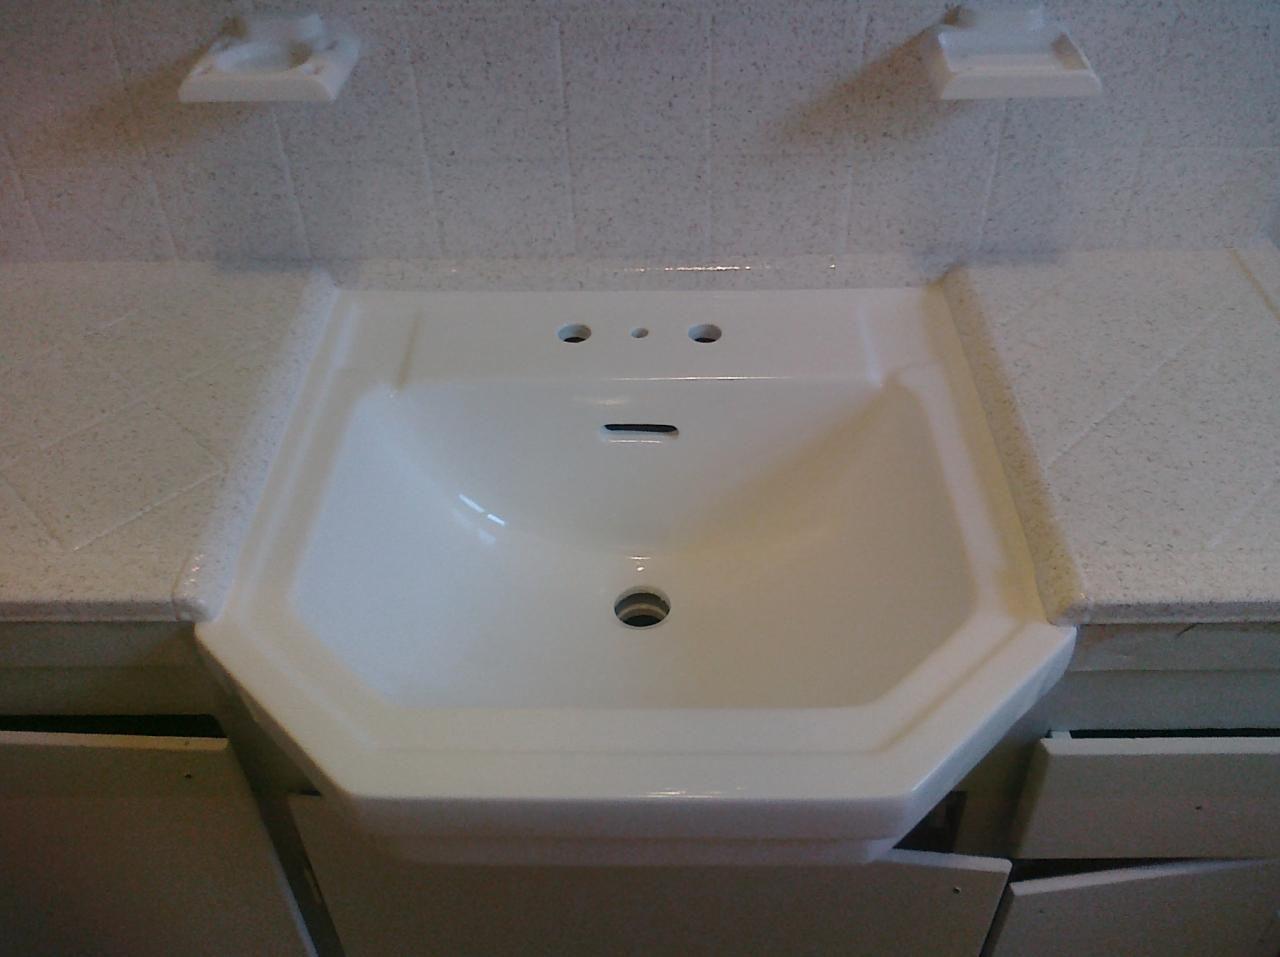 Pkb Reglazing Tile Bathroom Countertop Reglazed Cappucino